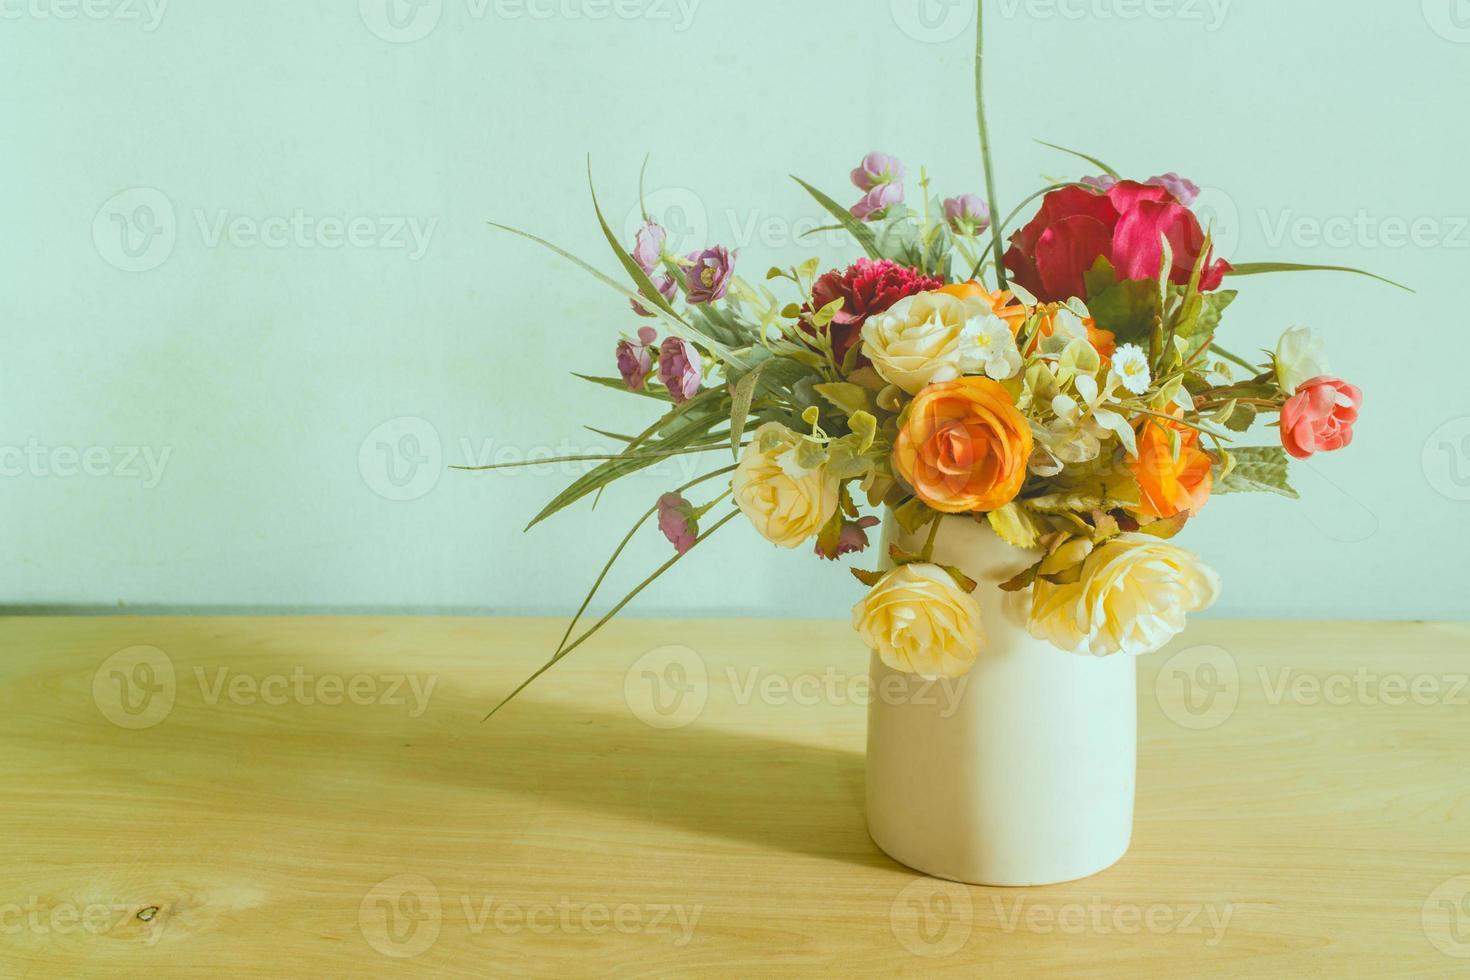 flores em vaso foto